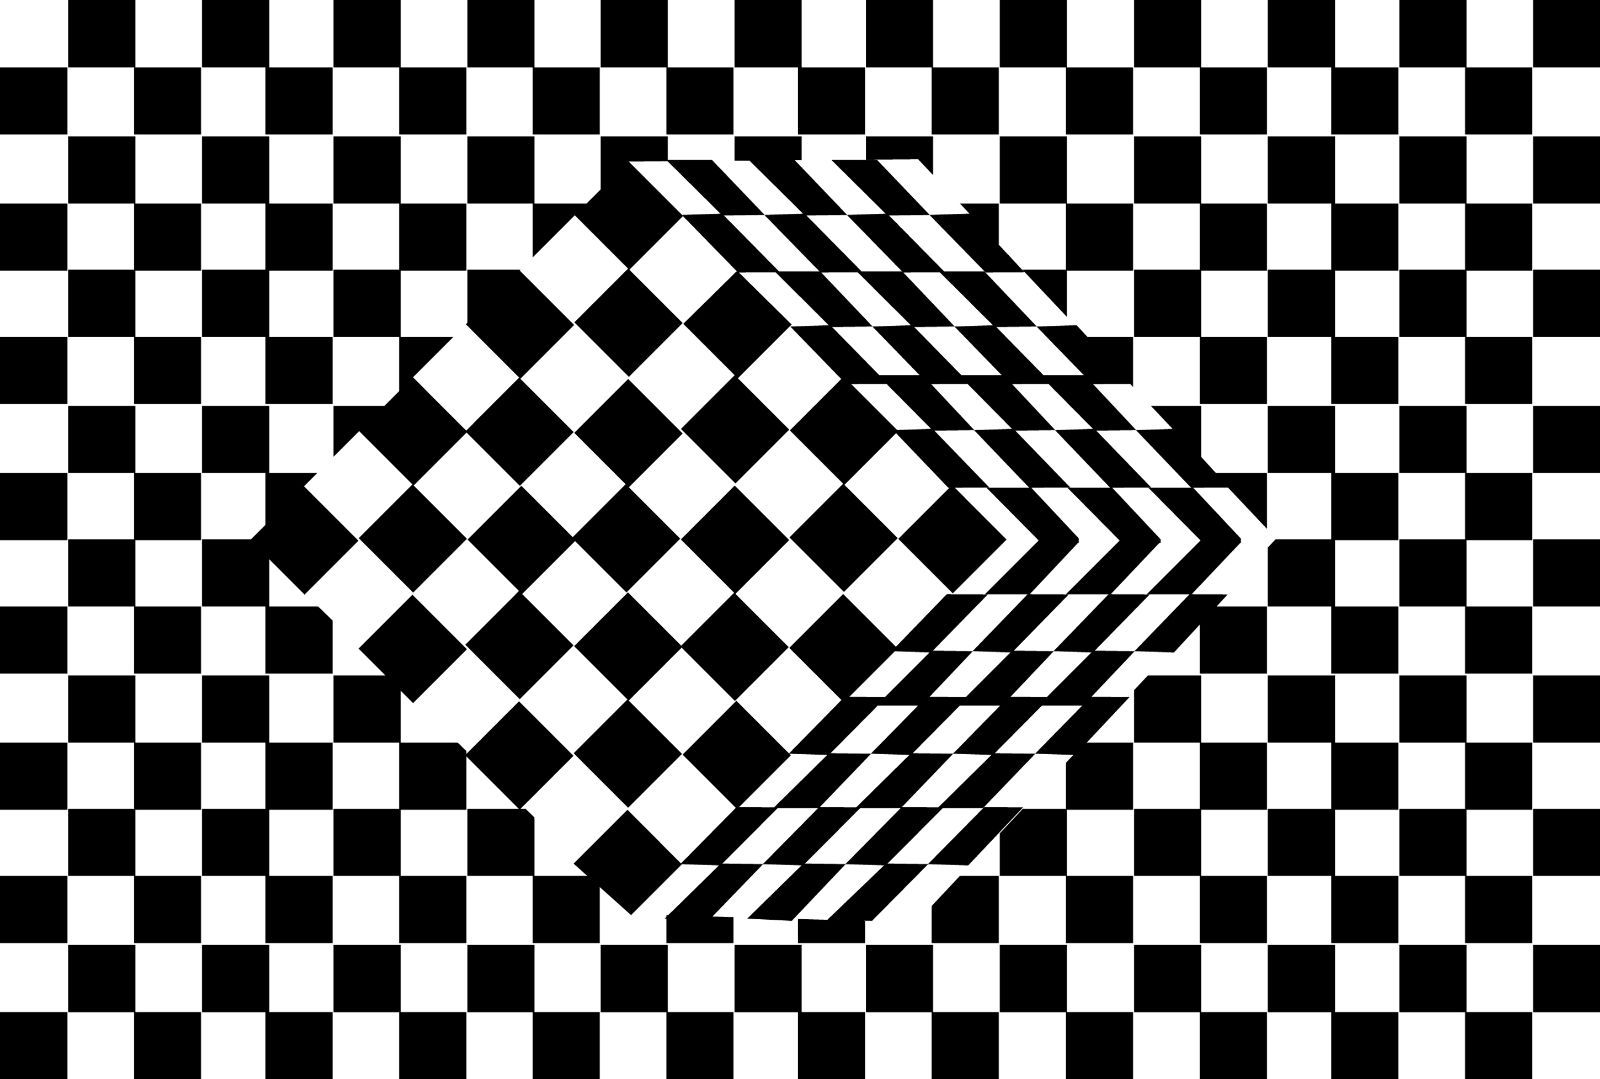 Illusion Color Pages Colorine Net 22568 Optical Illusions Art Optical Illusion Quilts Illusion Art